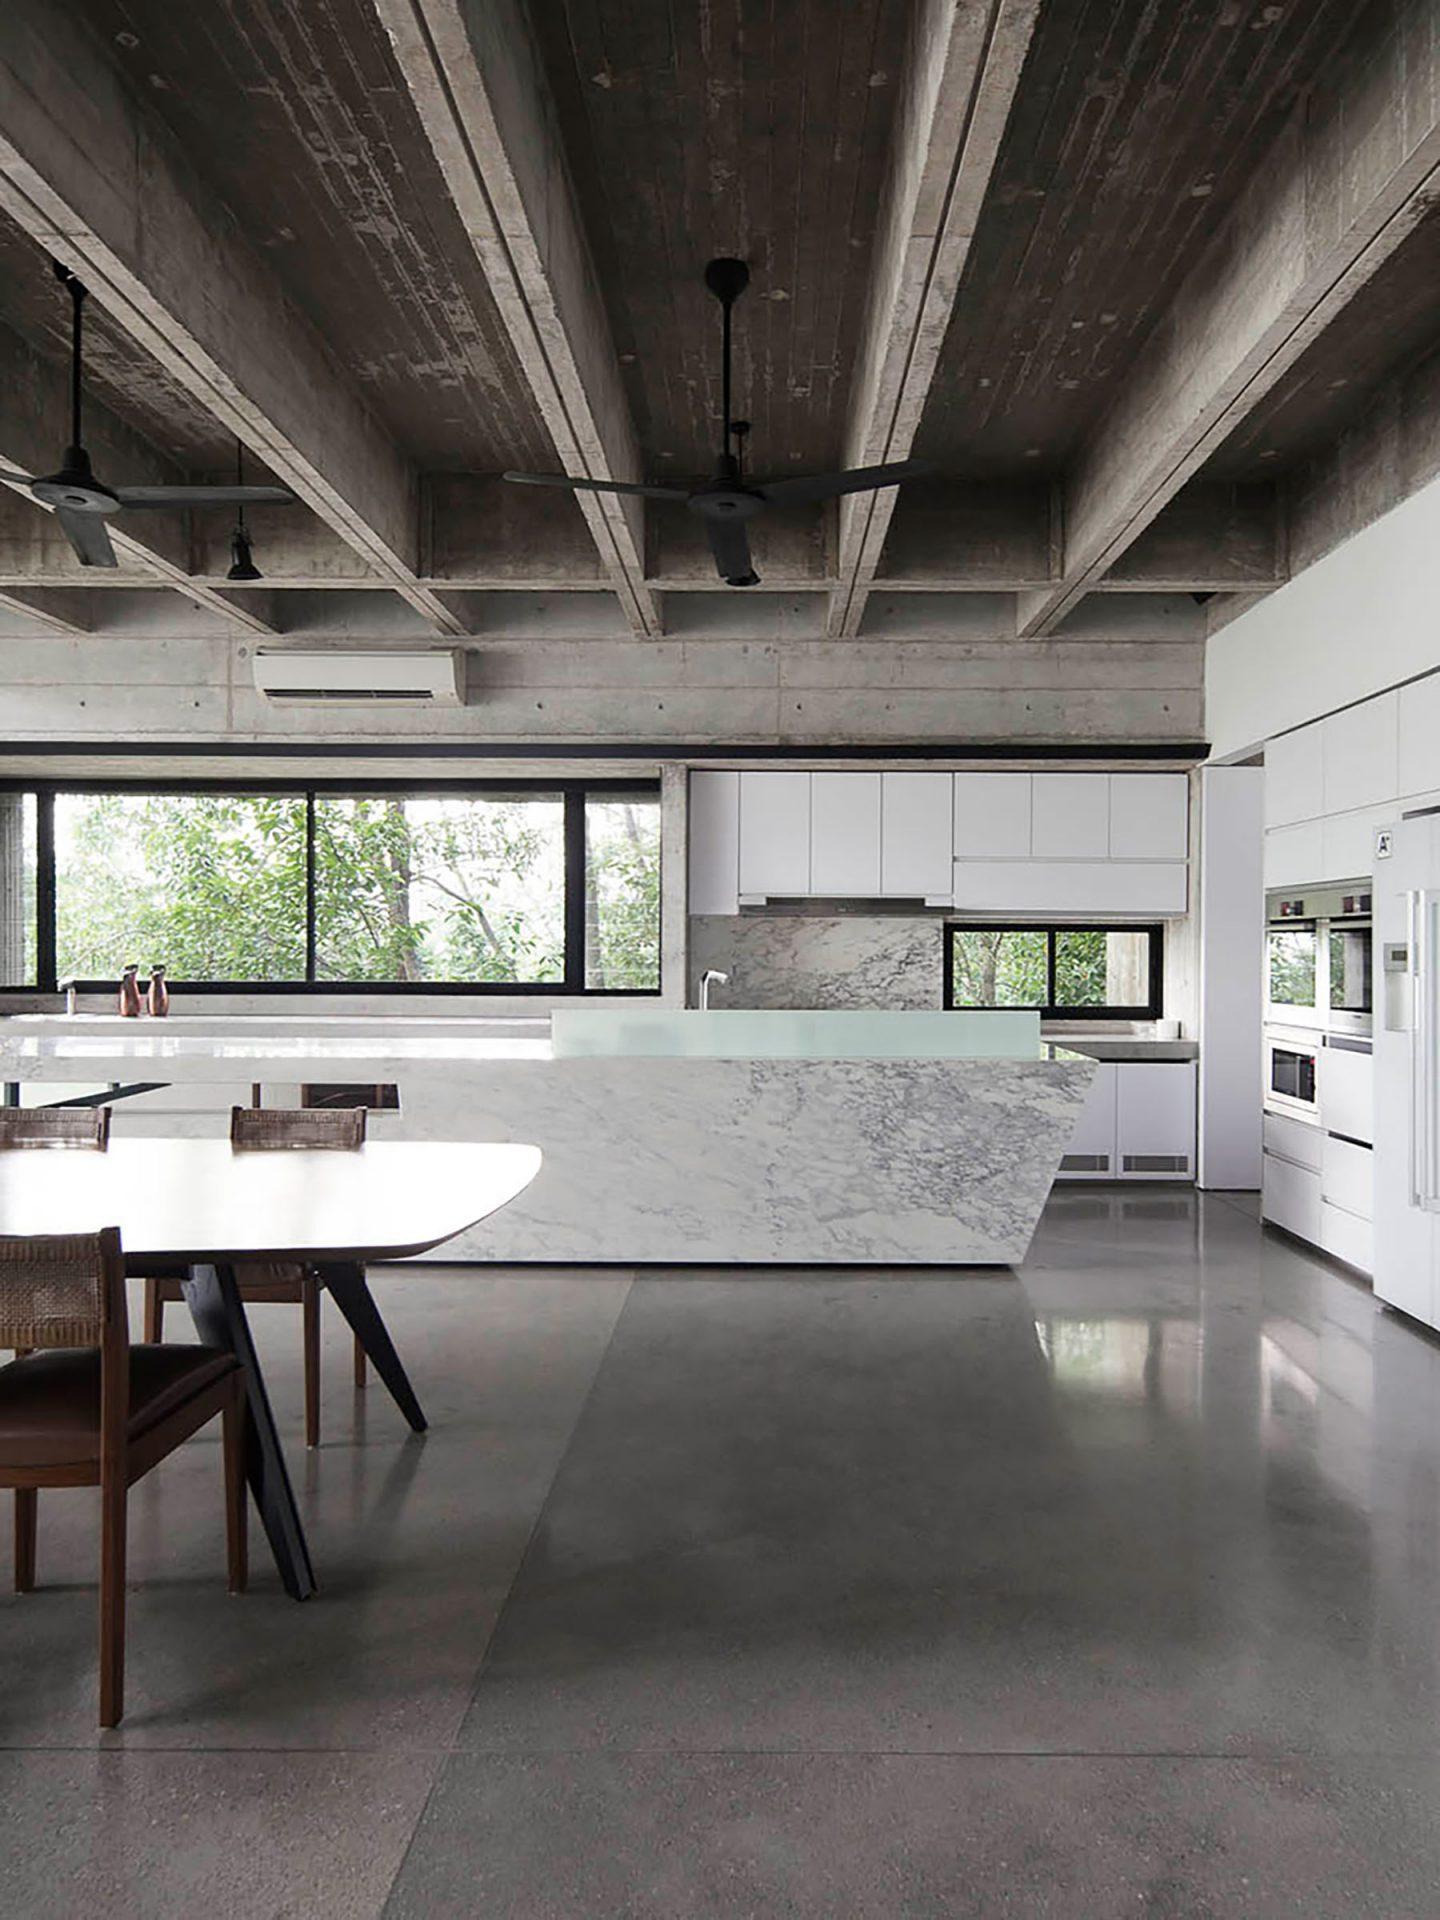 iGNANT-Architecture-Ben-Hosking-Chempenai-015